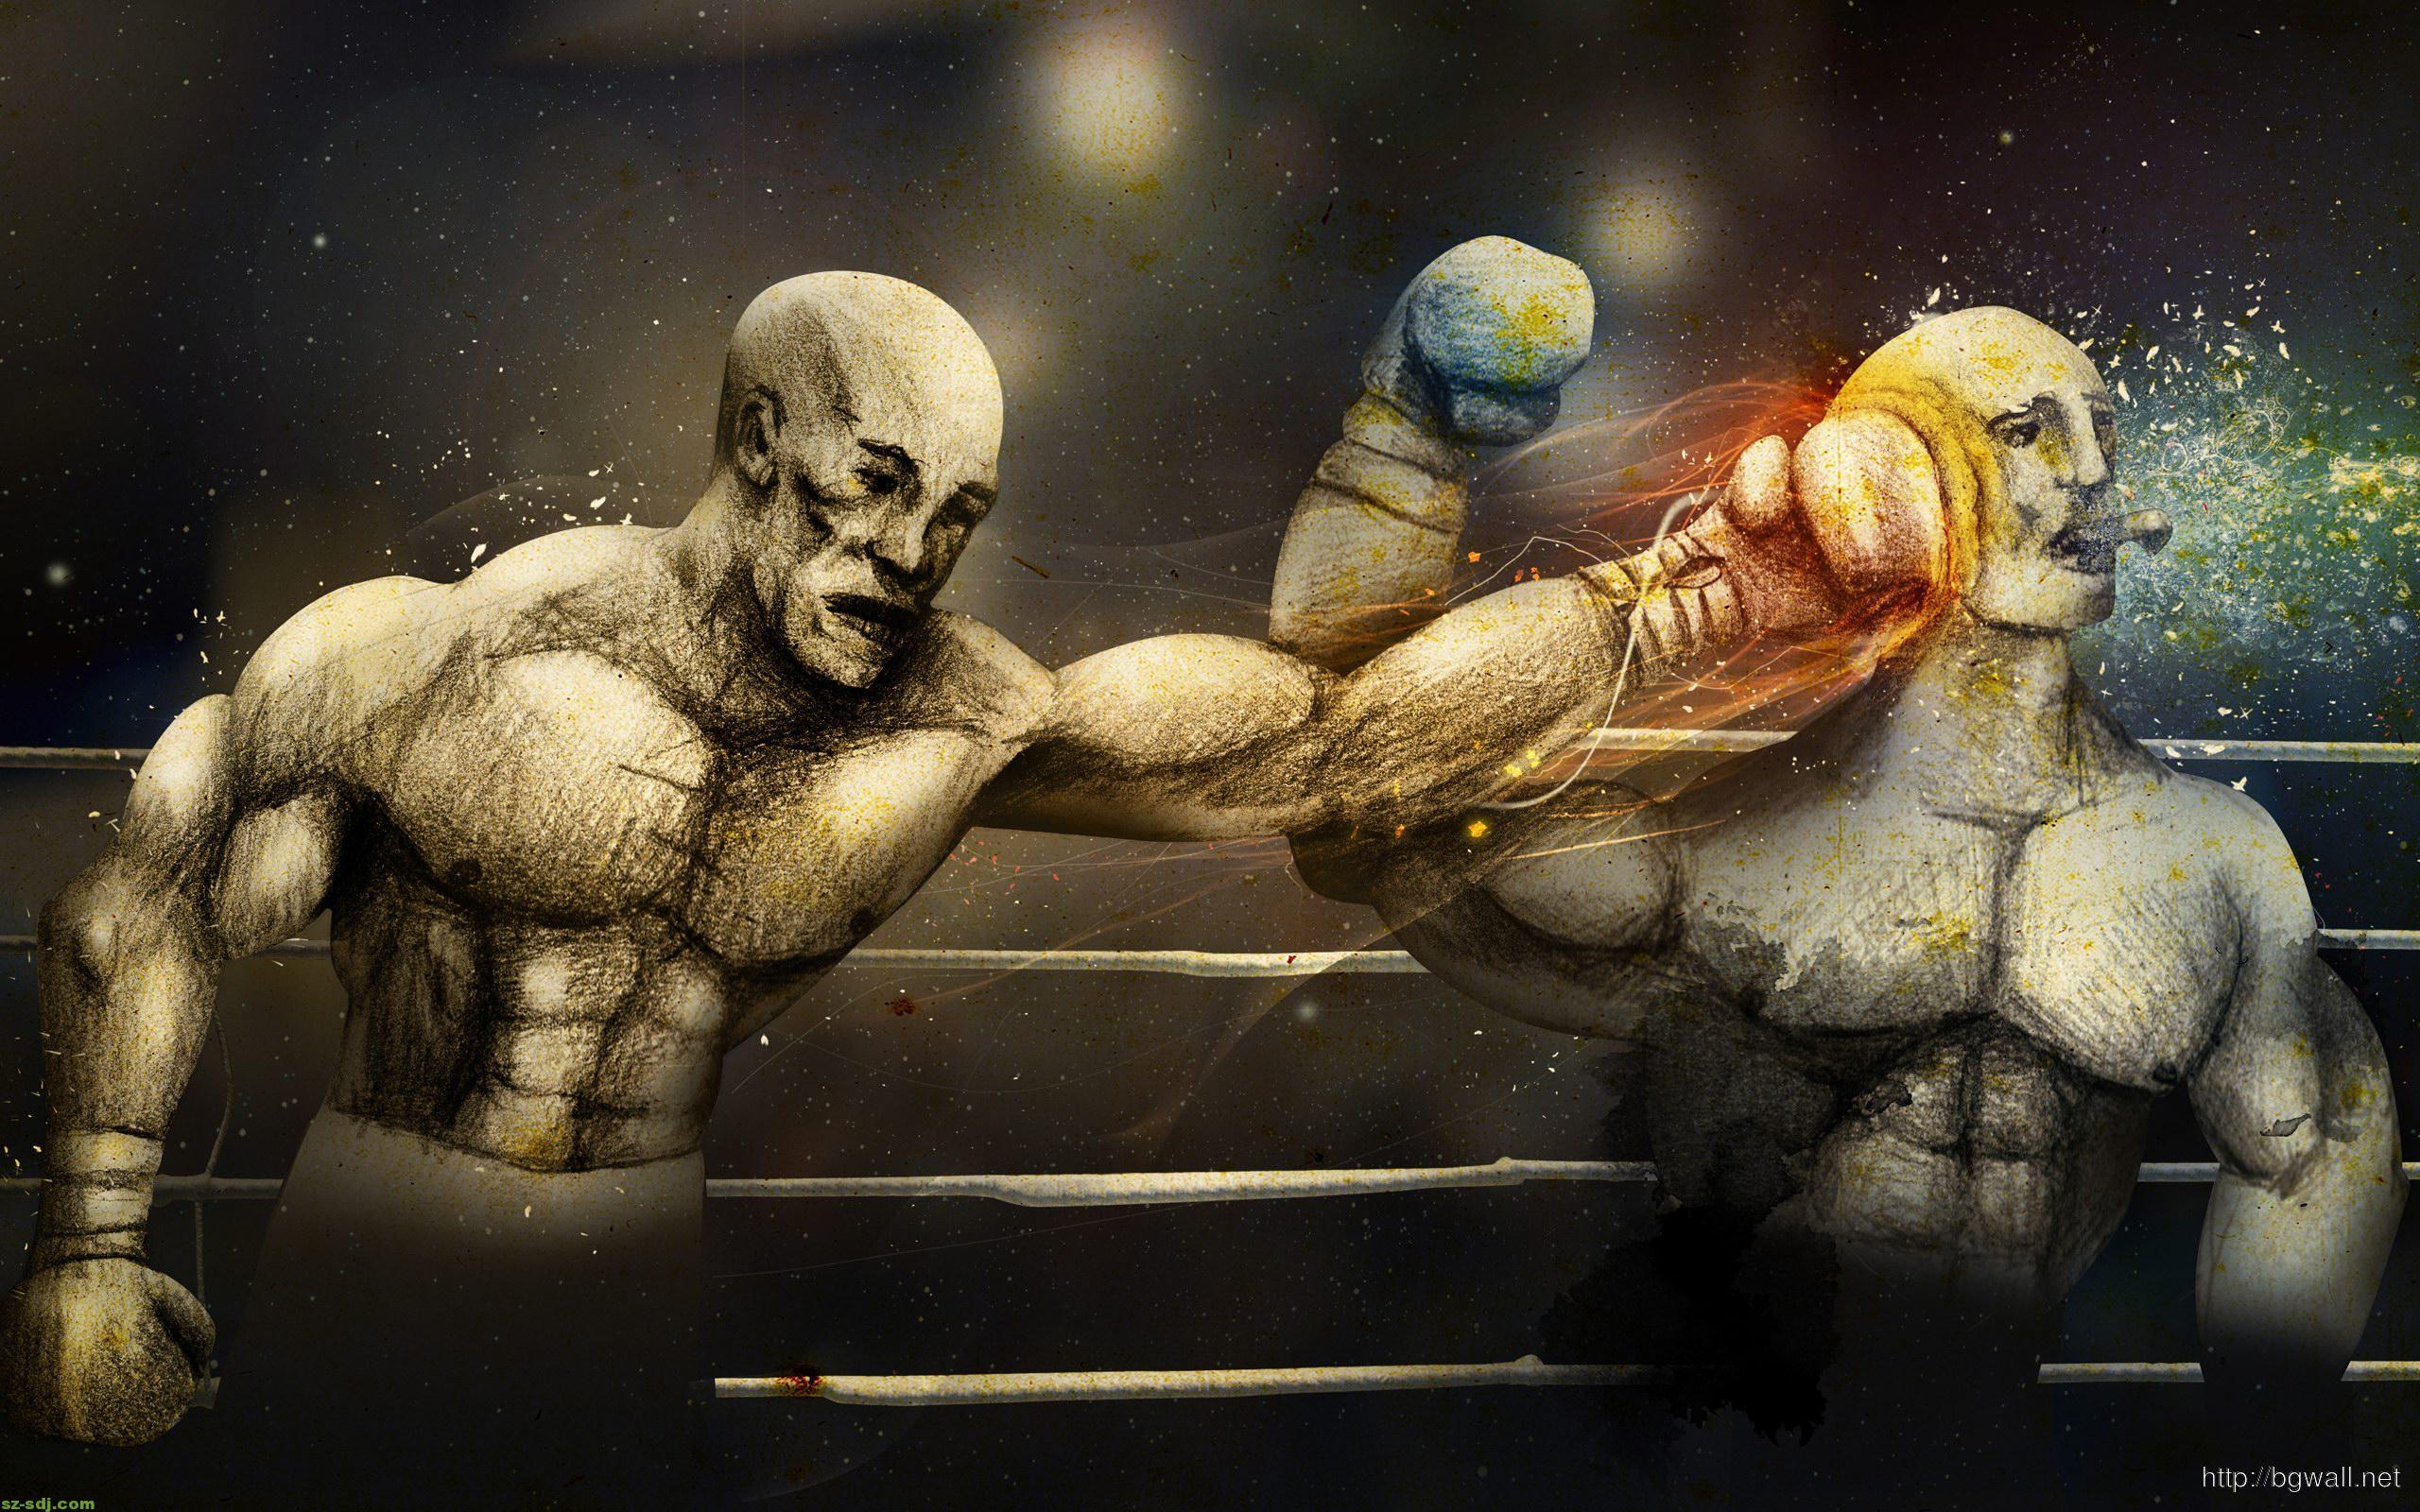 fantasy-boxing-wallpaper-image